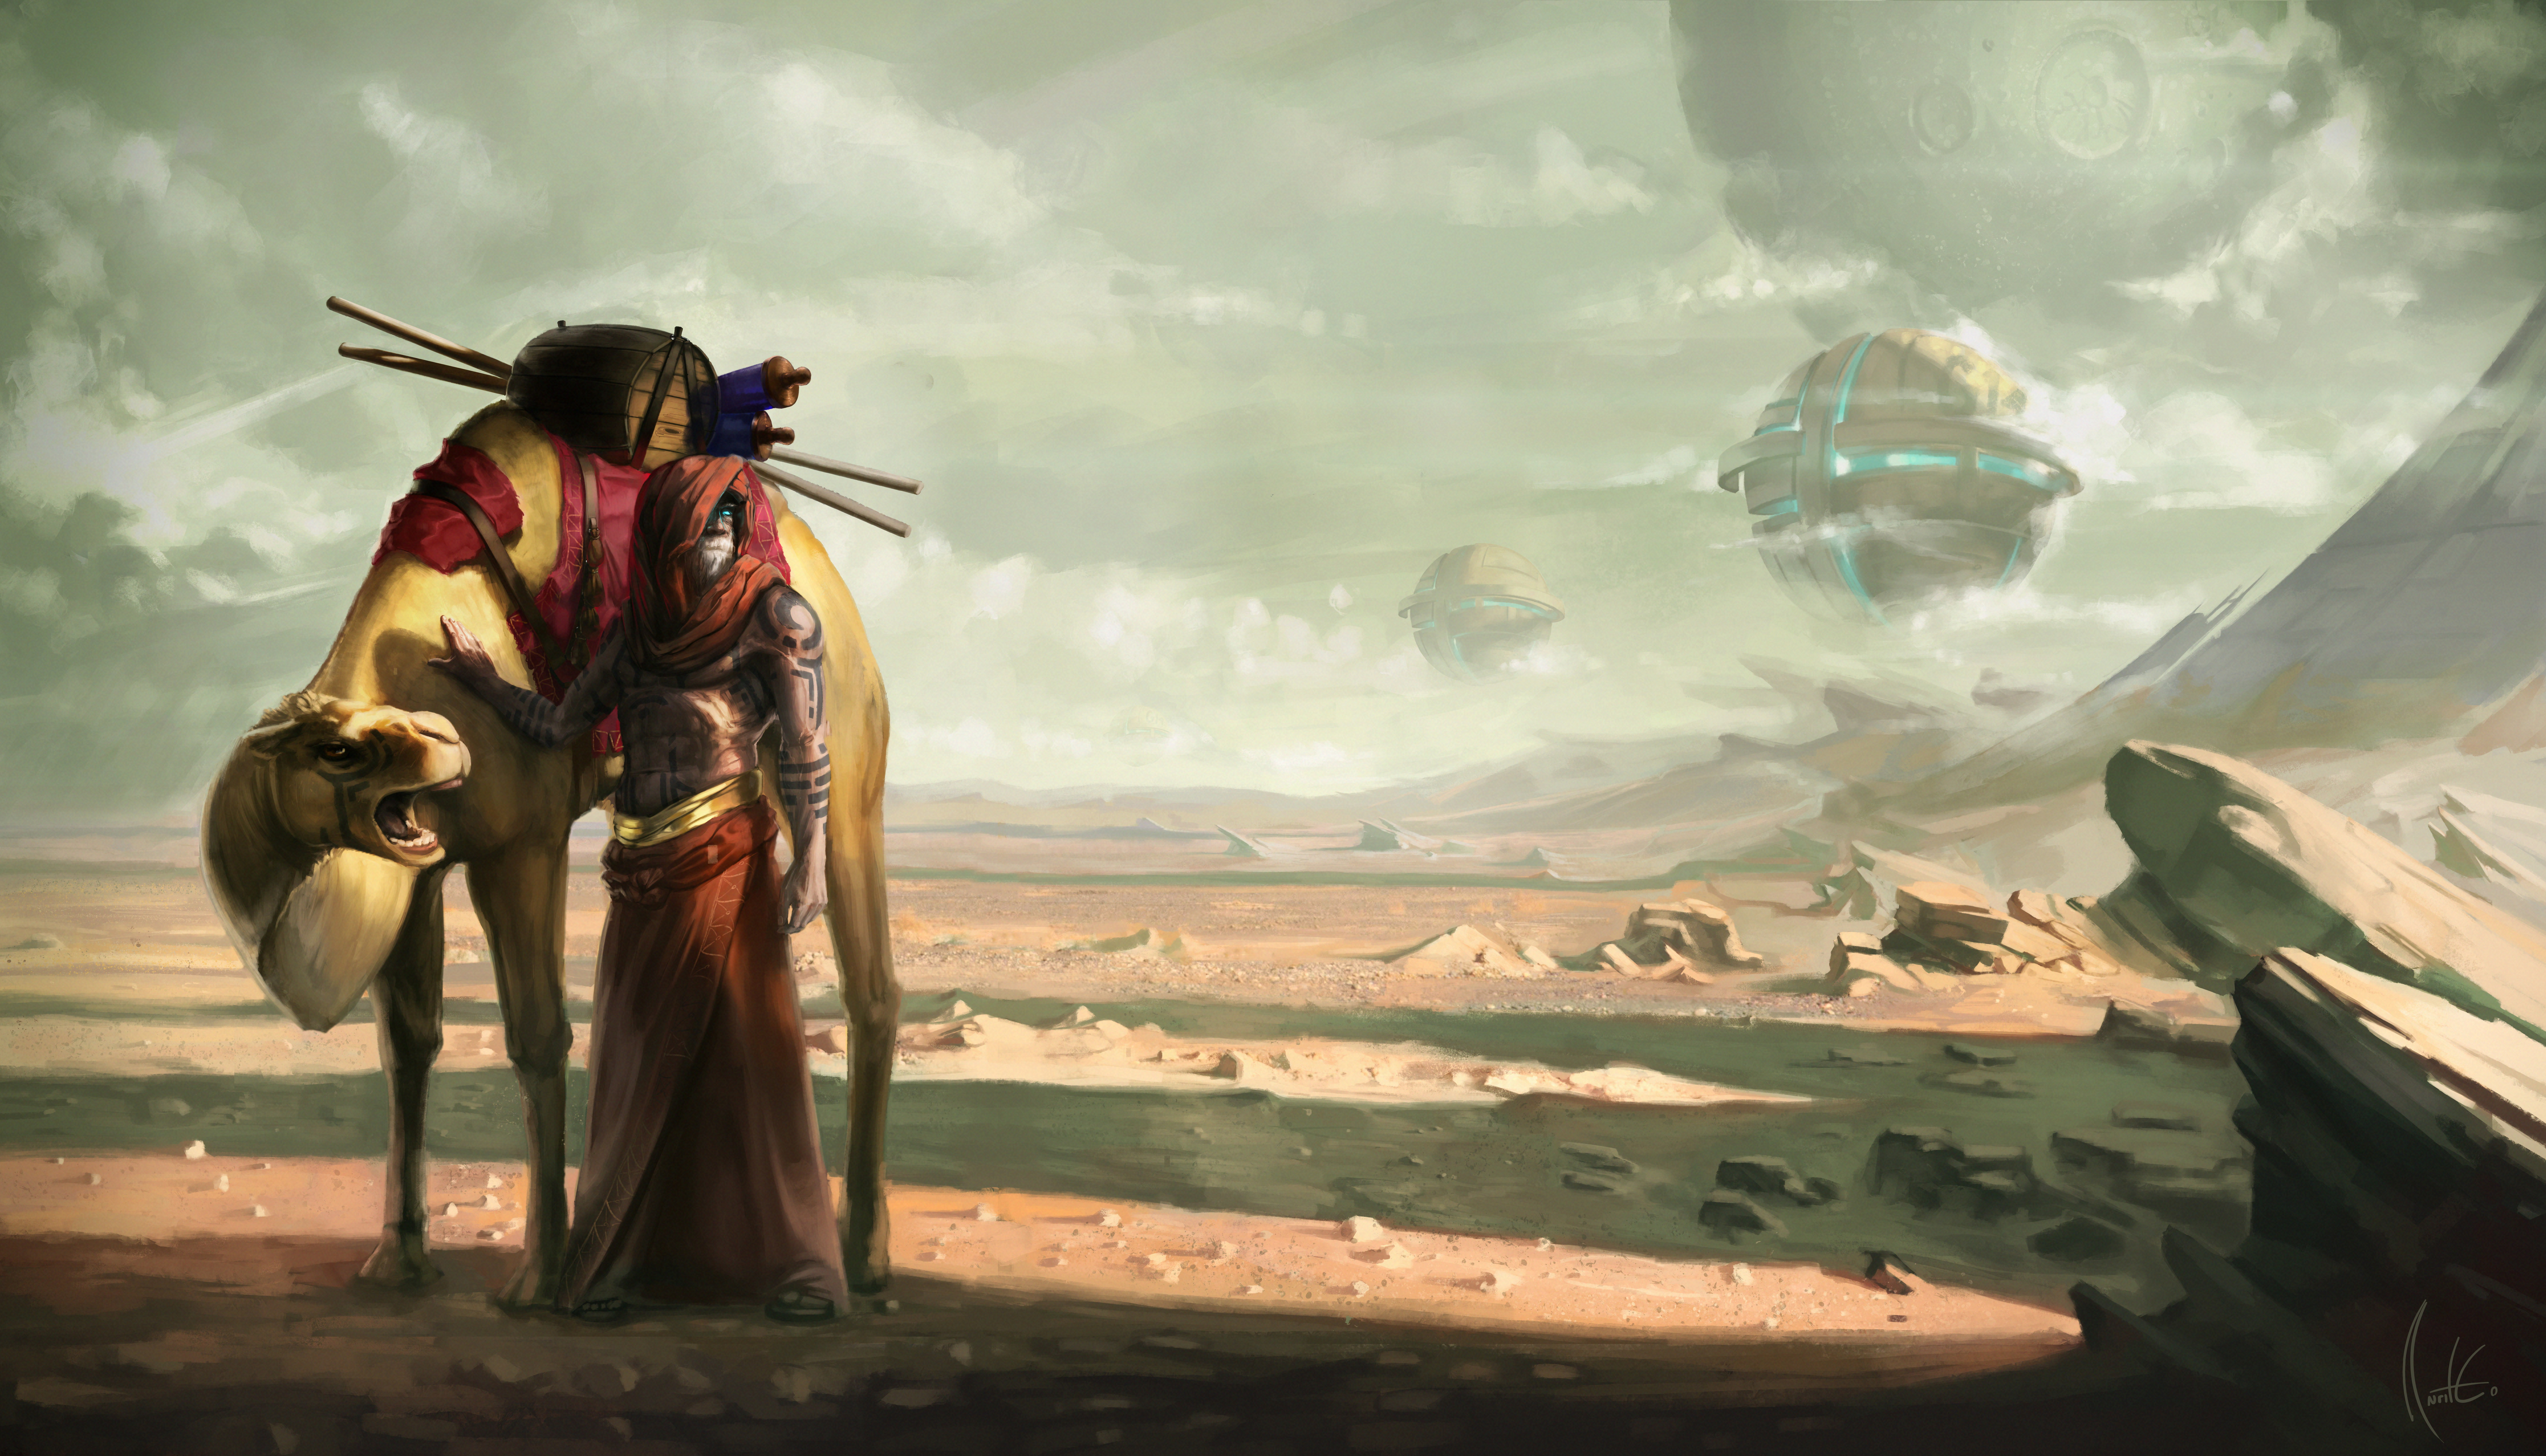 фэнтези пустыня без смс